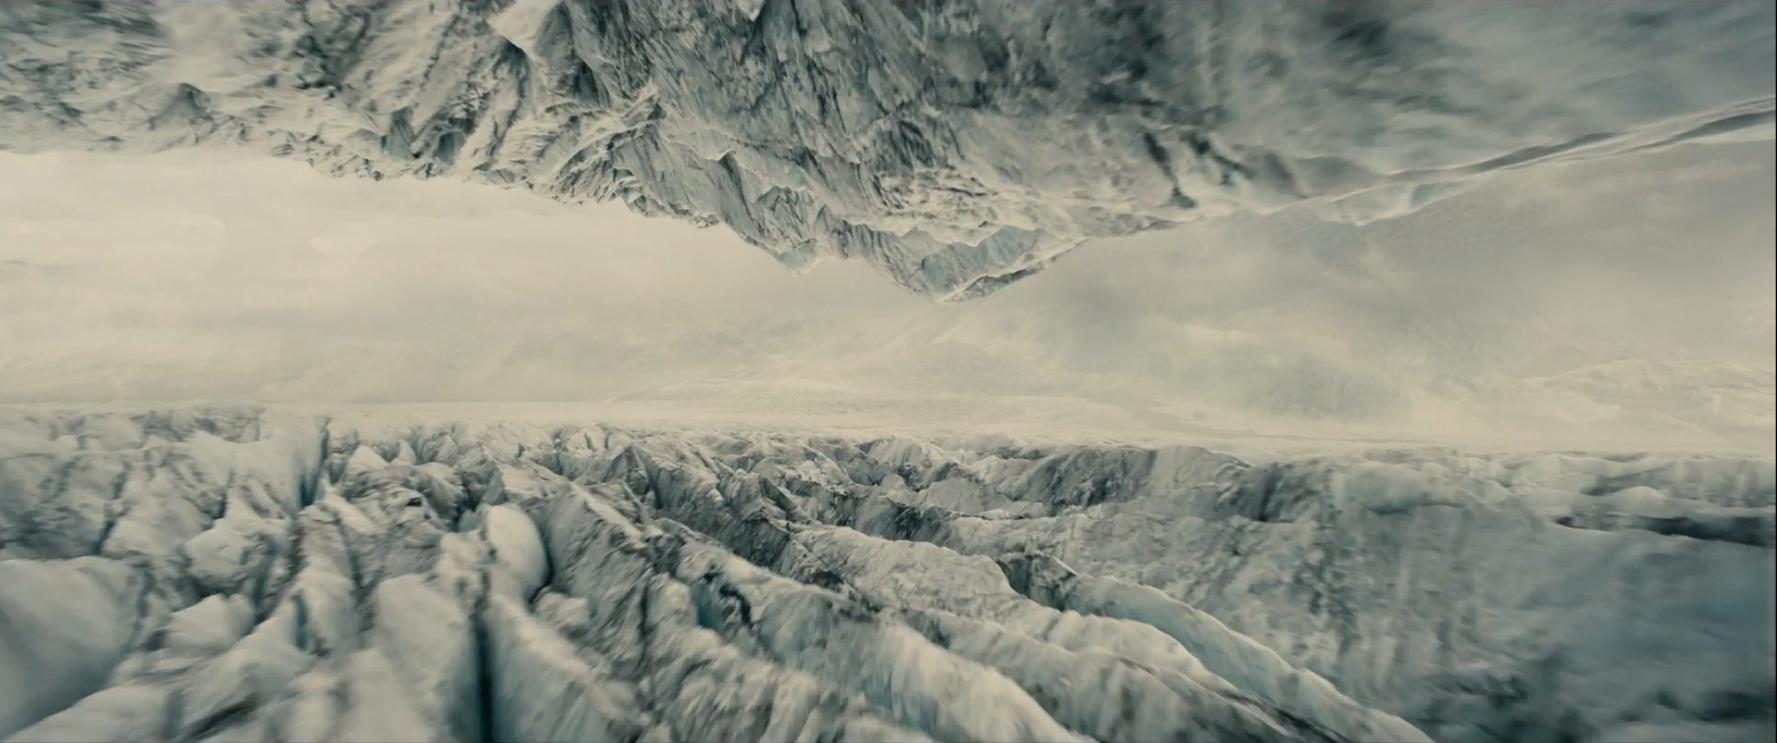 interstellar-ice